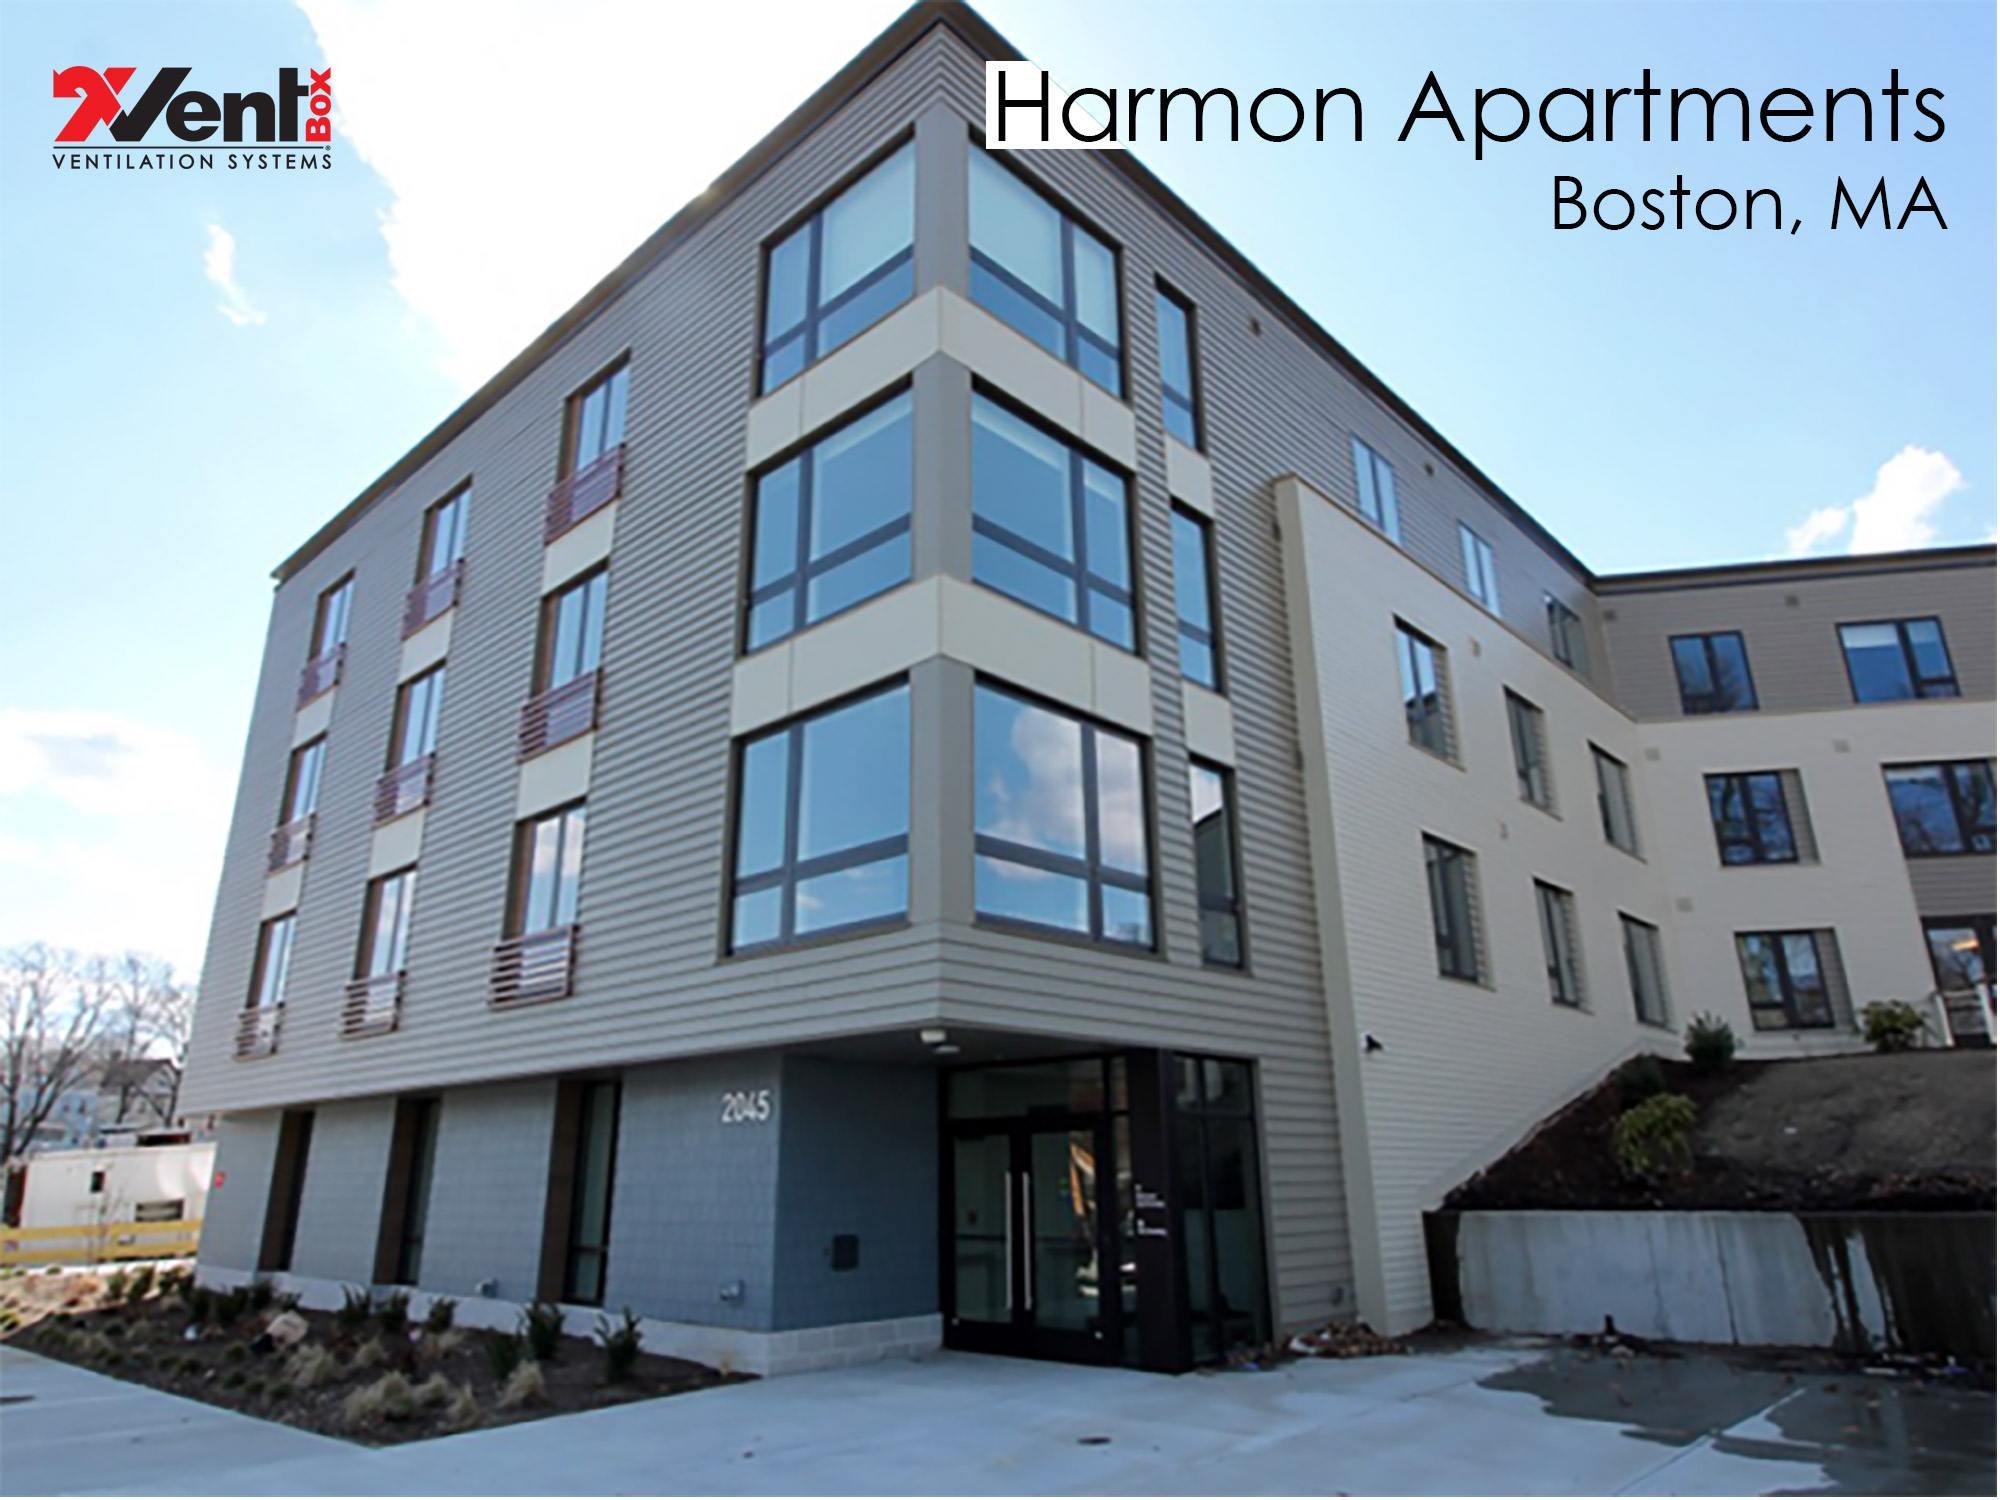 Harmon Apartments